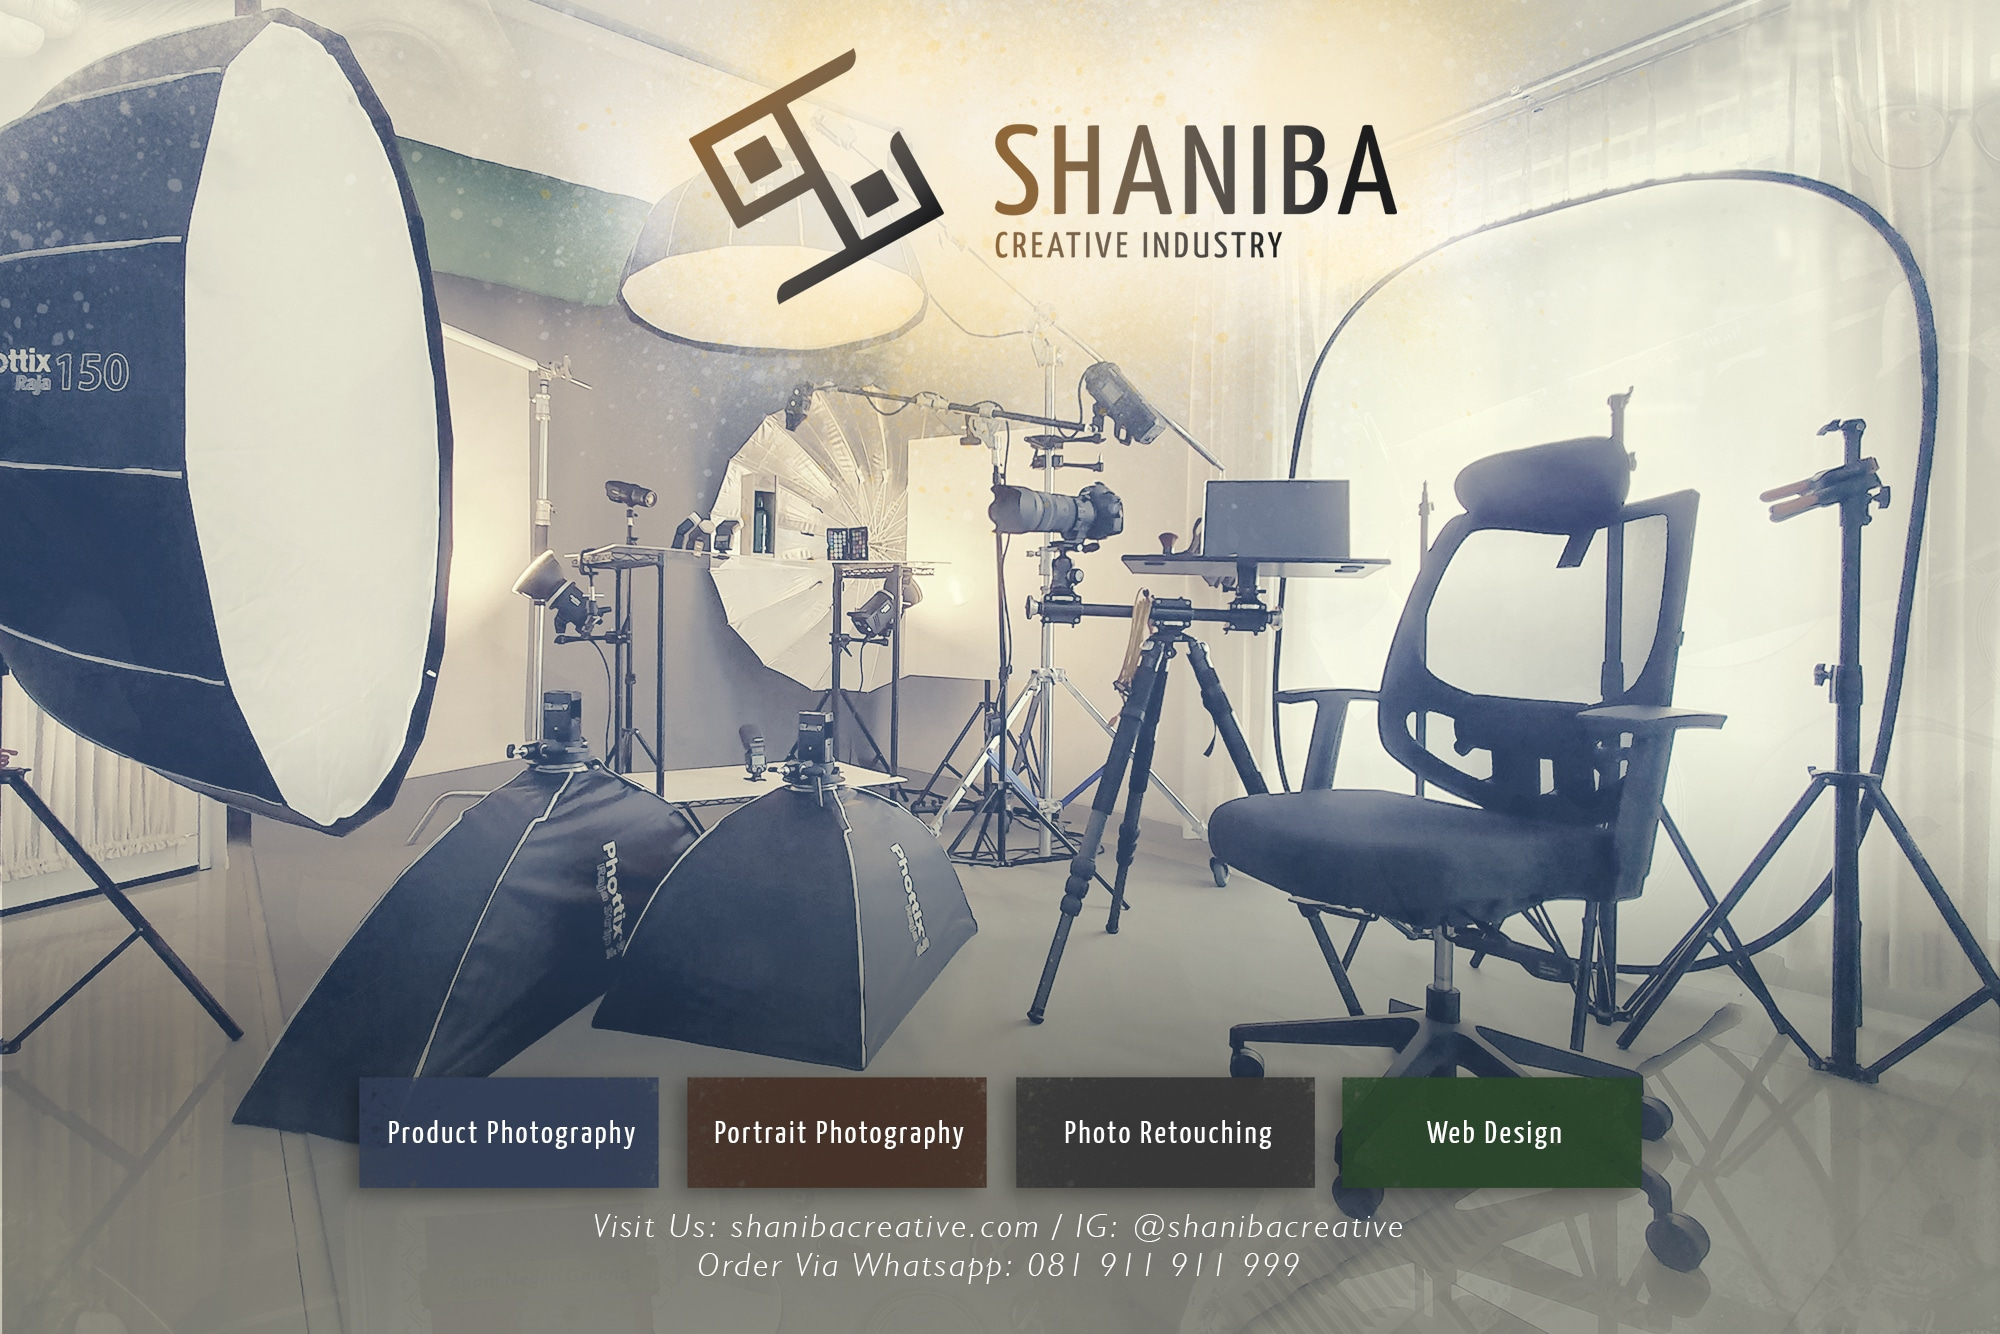 Studio Fotografi Shaniba Creative Industry - Jasa Foto Produk, Jasa Foto Portrait, & Jasa Edit Foto